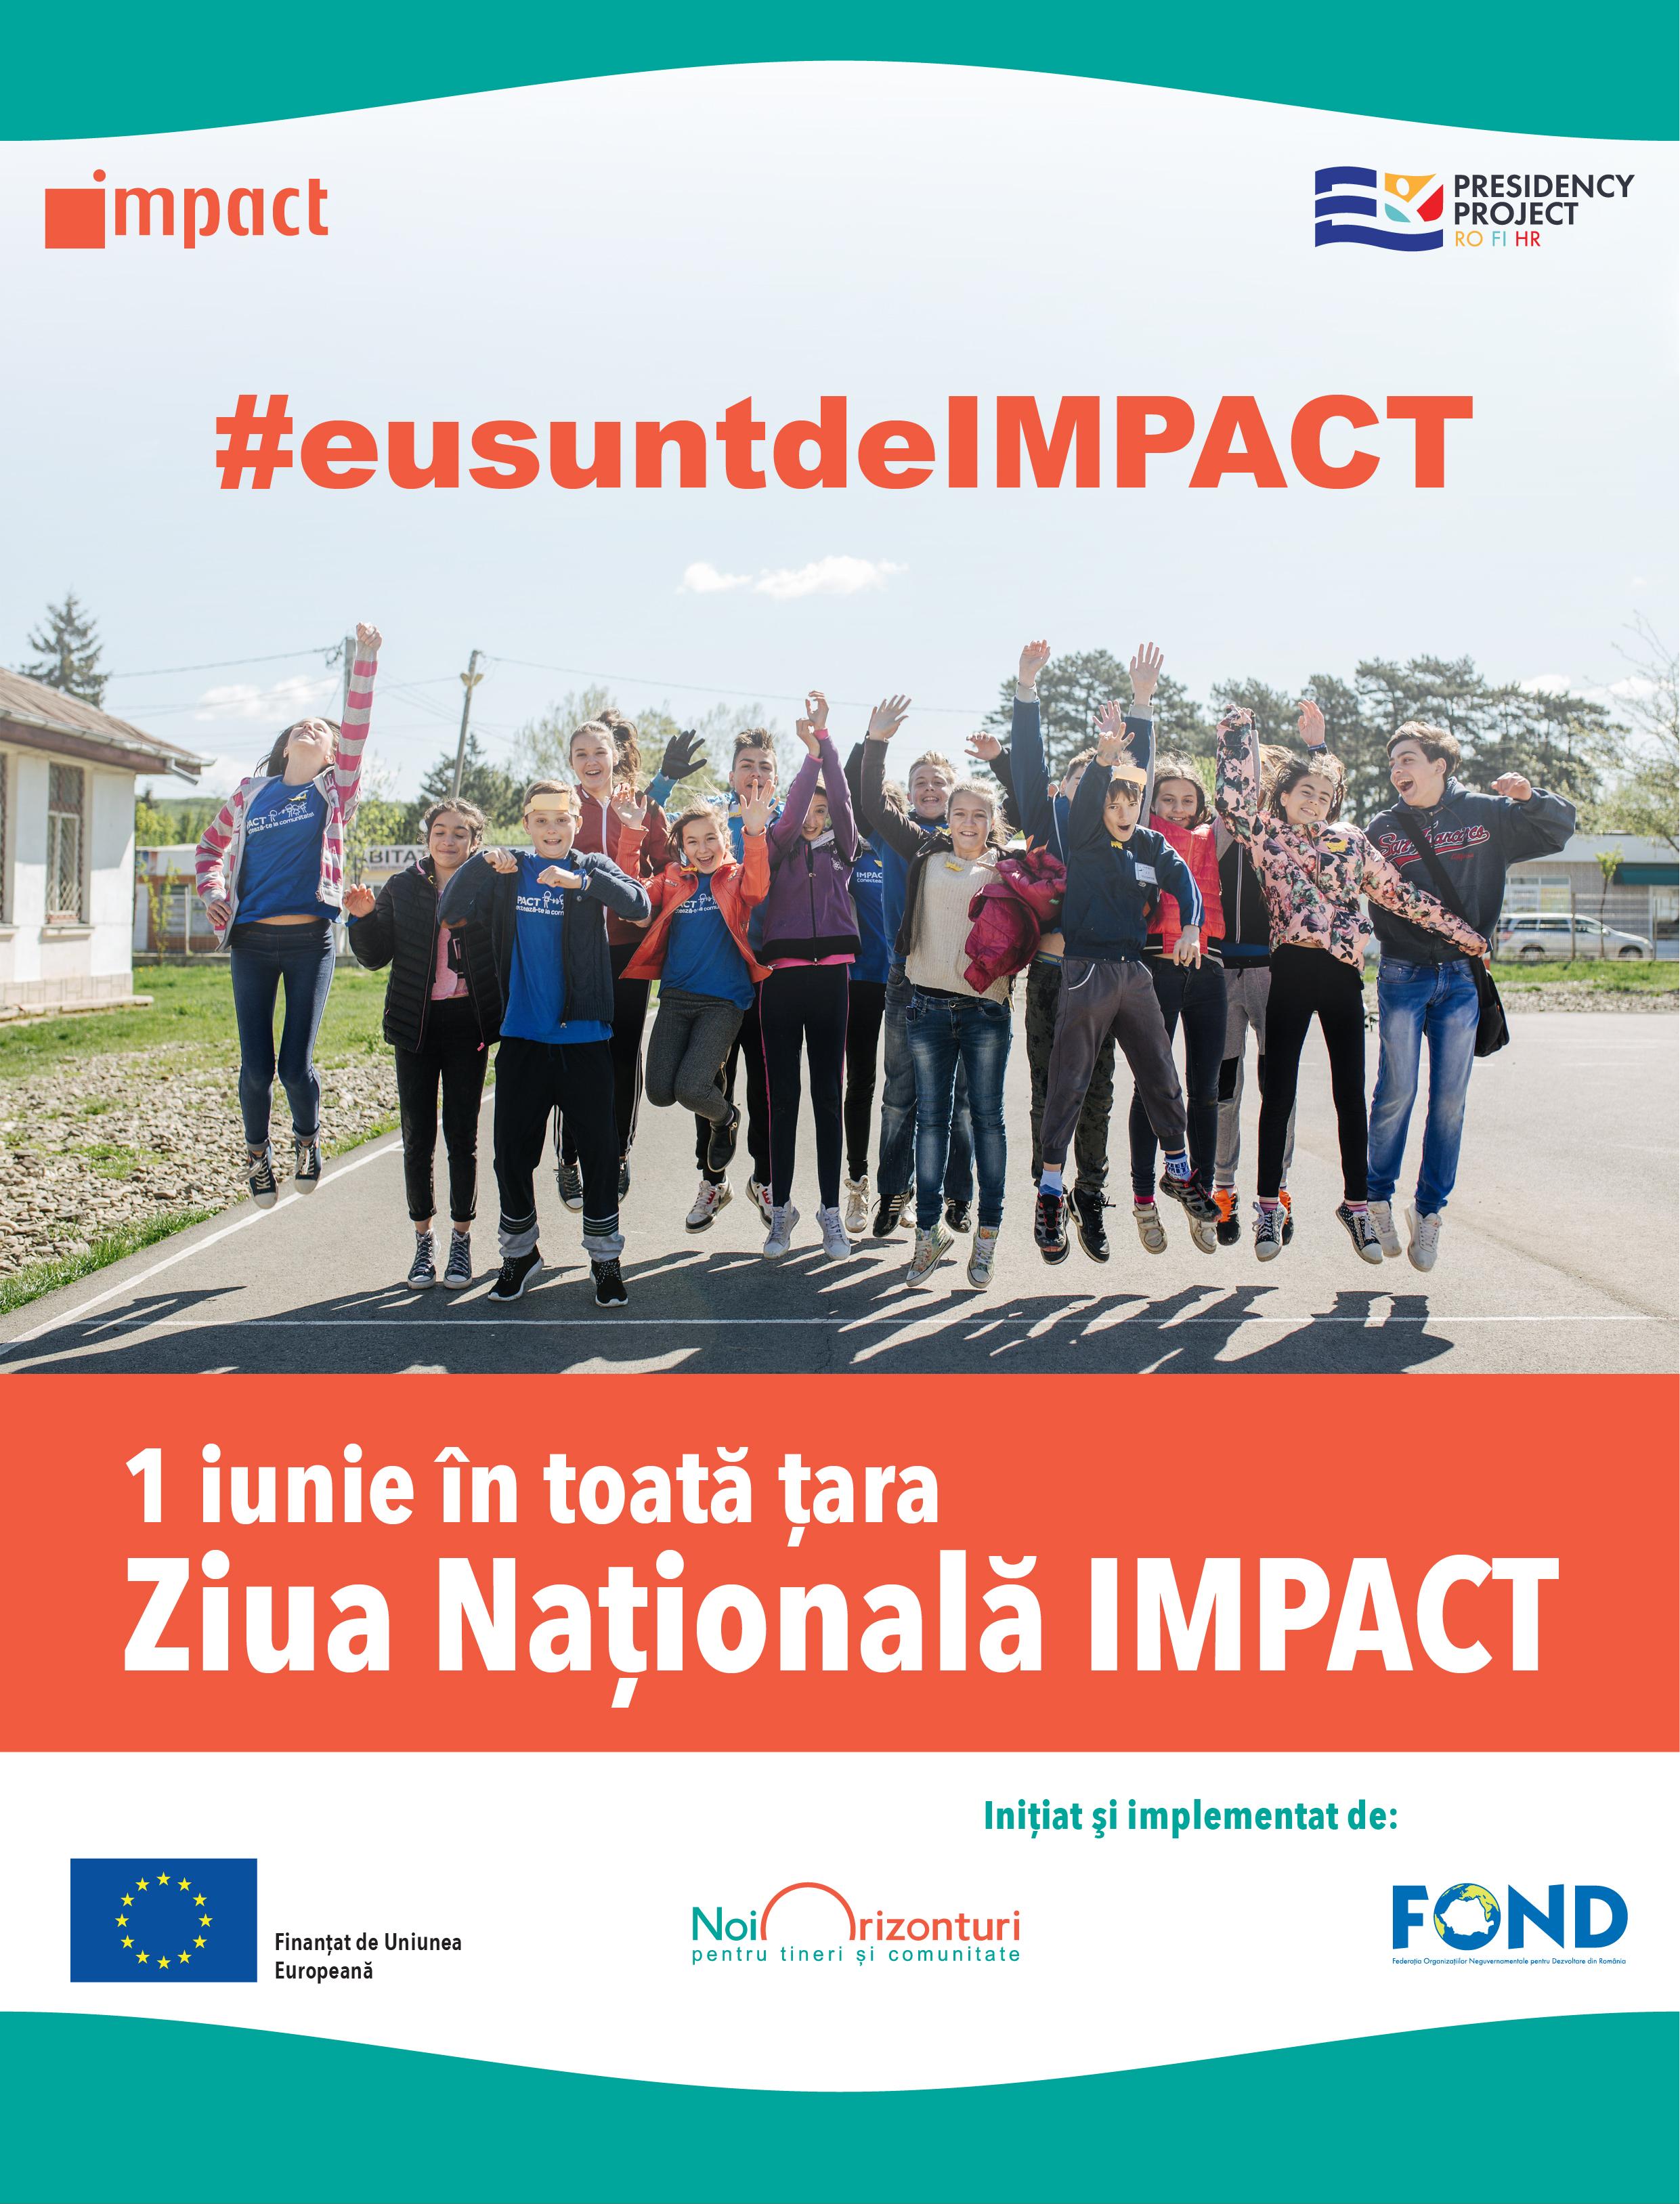 3000 de tineri spun la unison #eusuntdeIMPACT